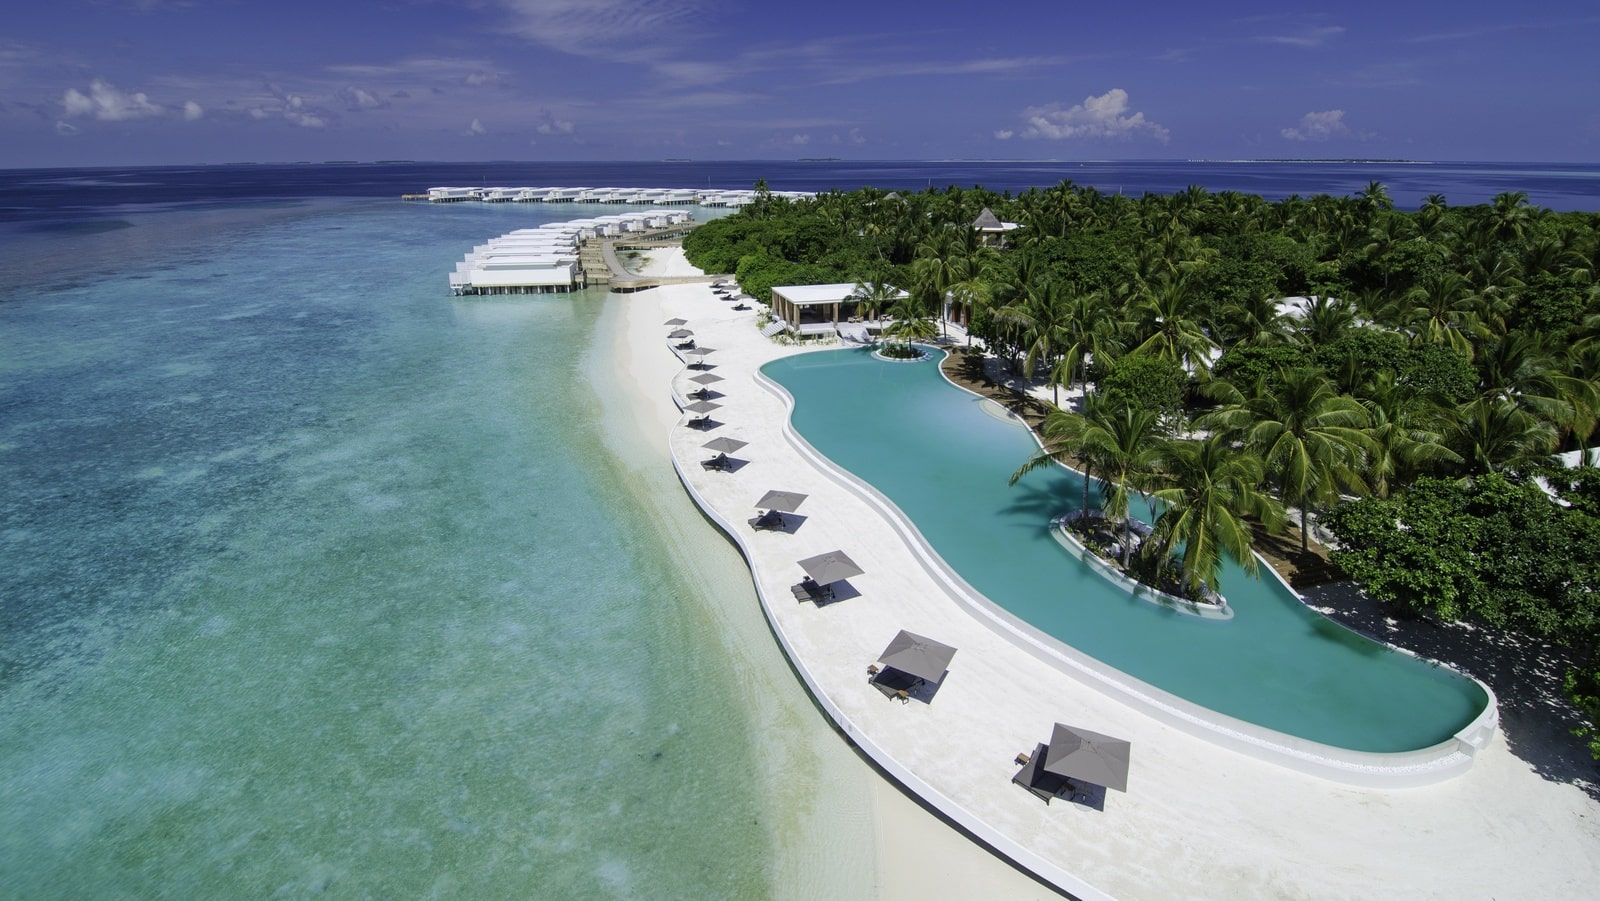 Мальдивы, отель Amilla Fushi Maldives, бассейн